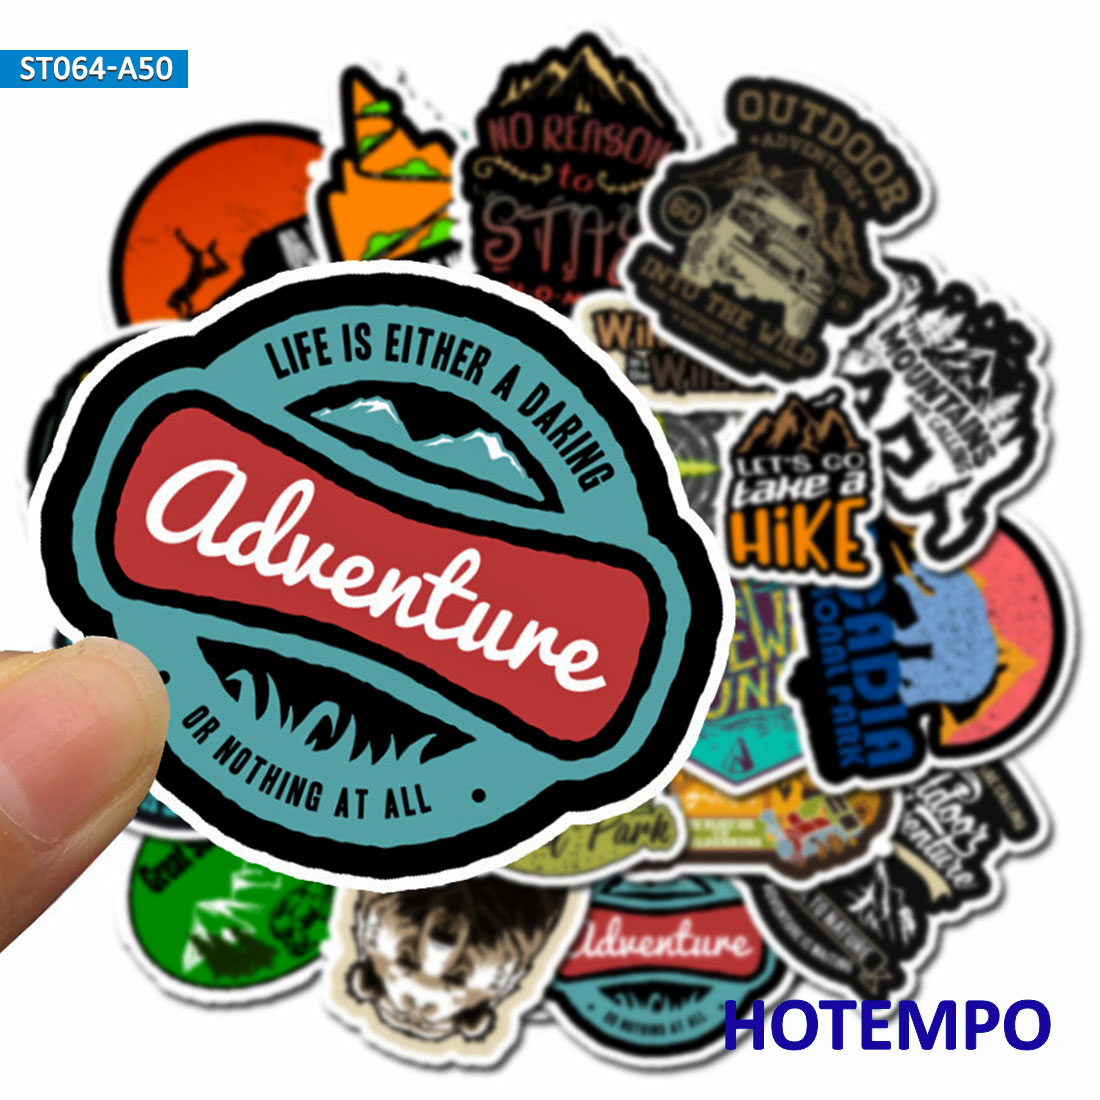 50 Pack Outdoor Adventure Hiking Trolley Case Skateboard Notebook Sticker Lldty